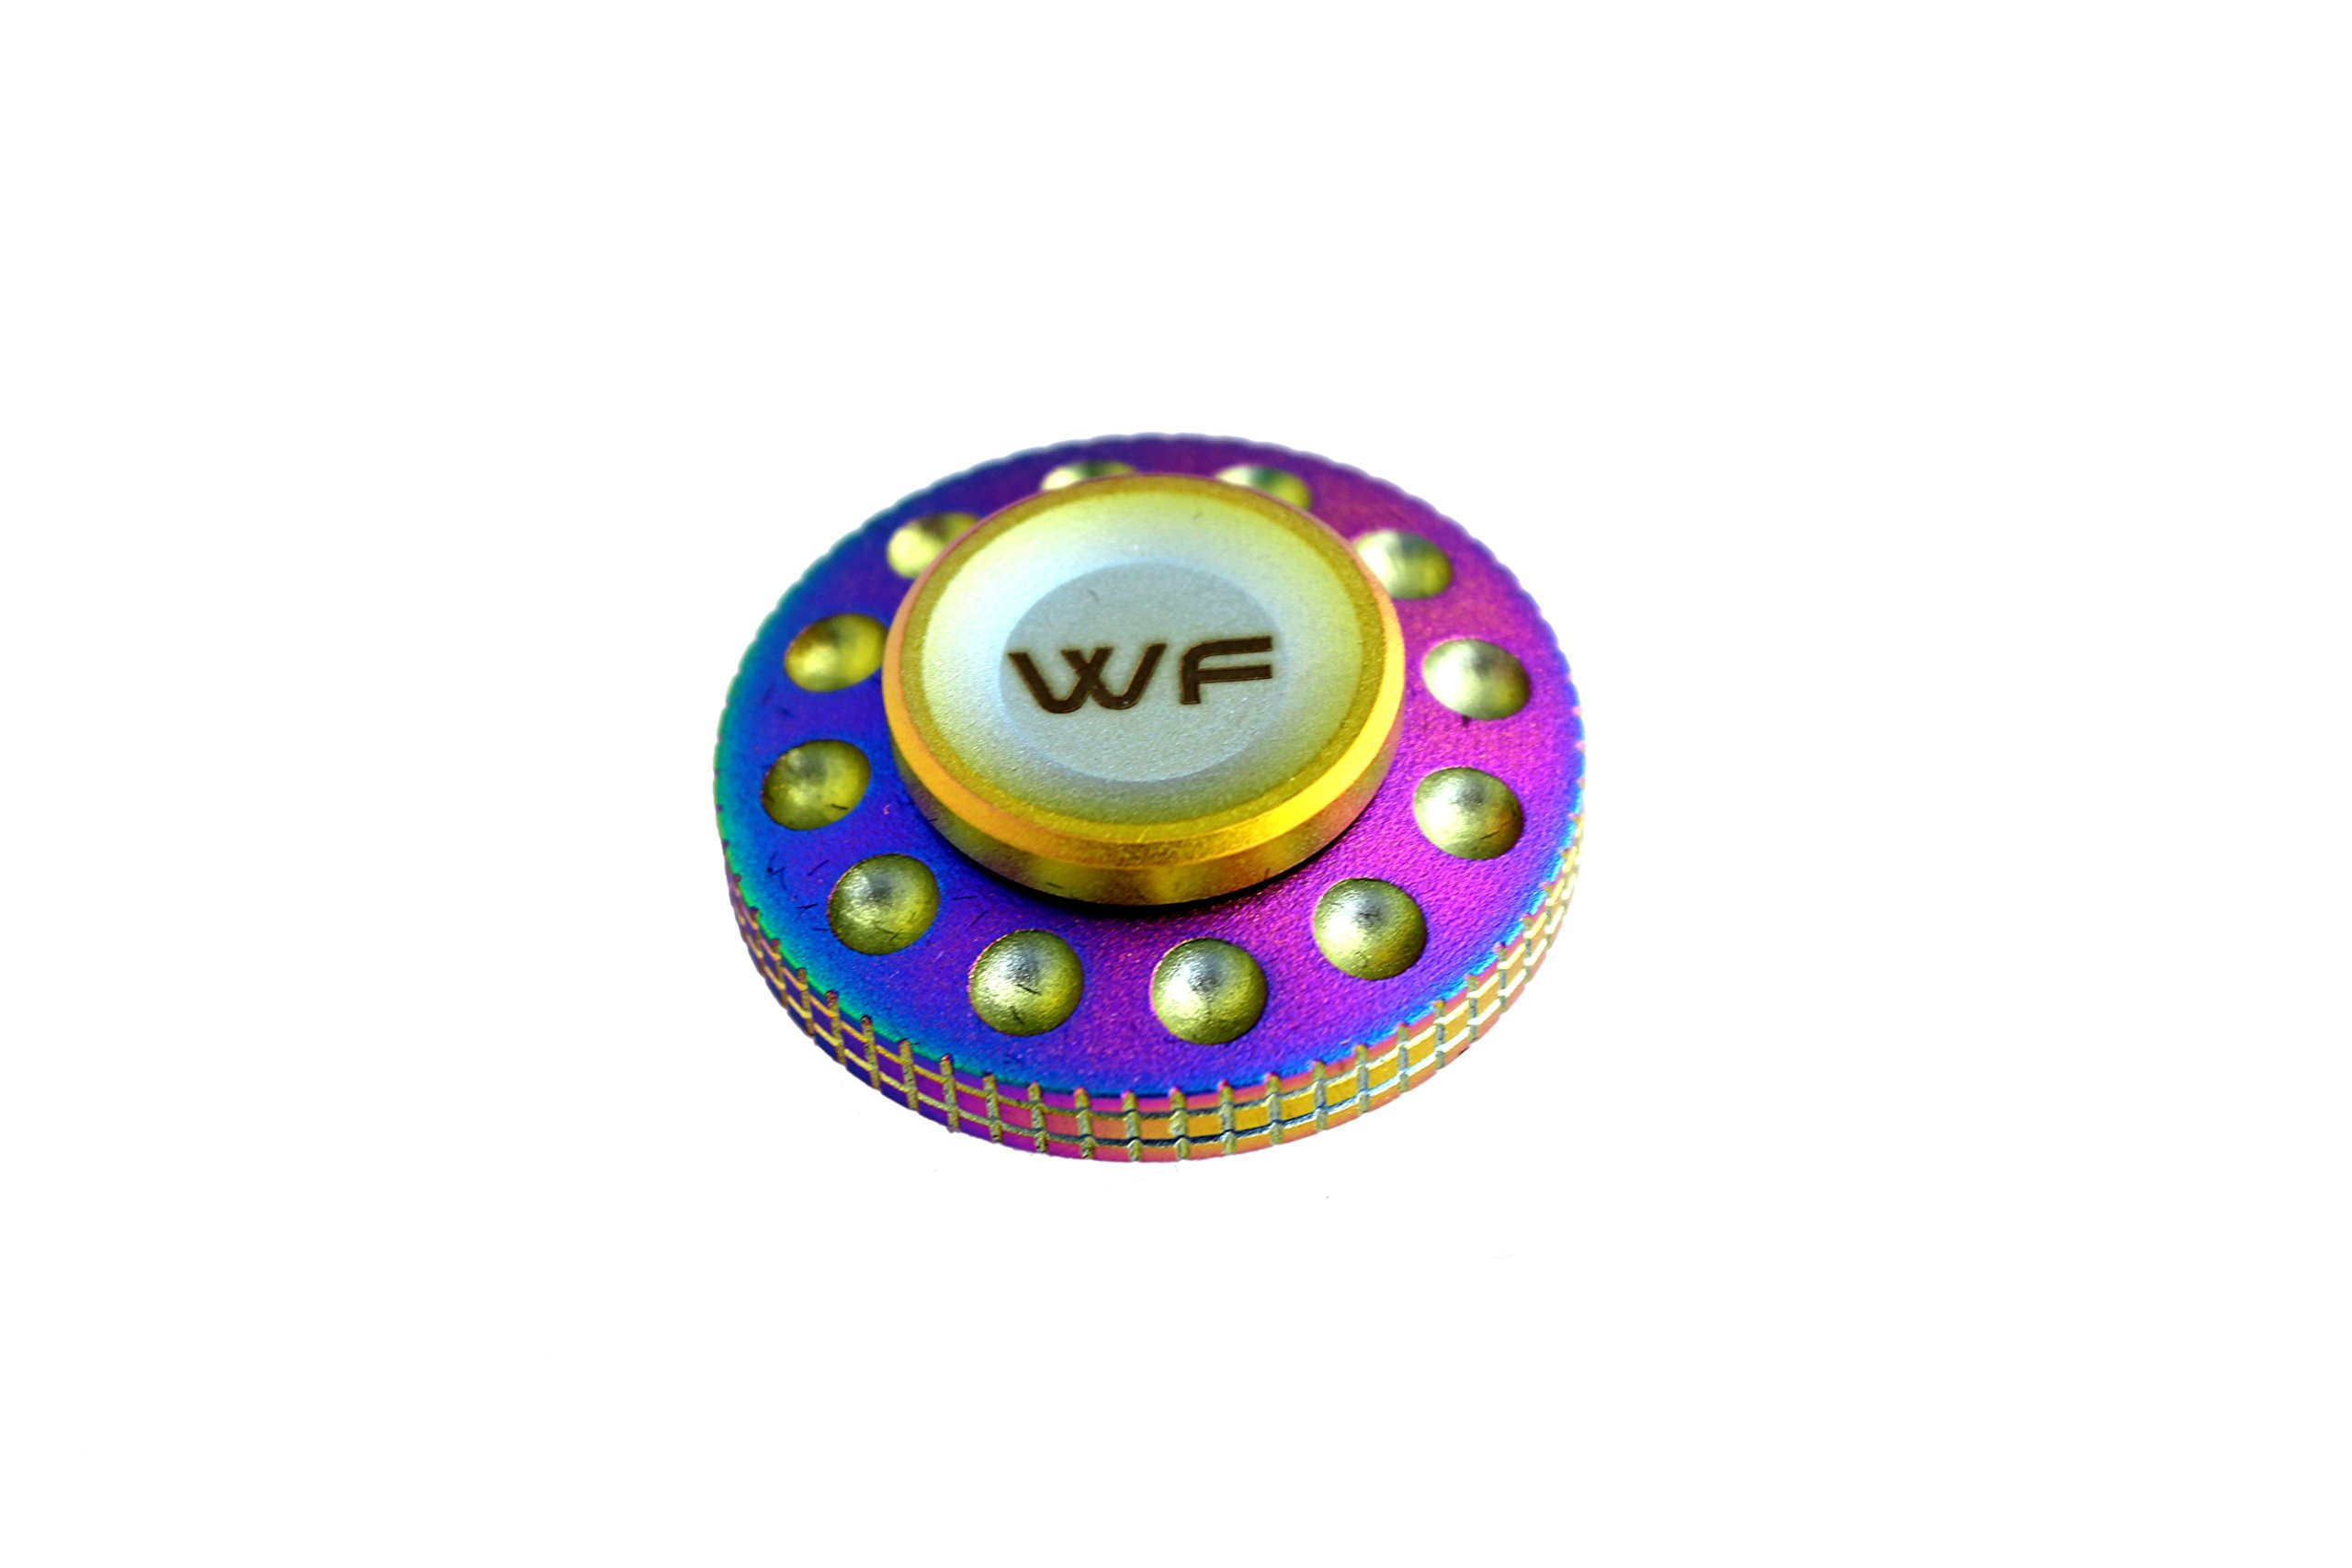 WeFidget Original Mini UFO Fidget Spinner, Super Discrete, Premium Finish, Replaceable Bearings. by WeFidget (Image #2)